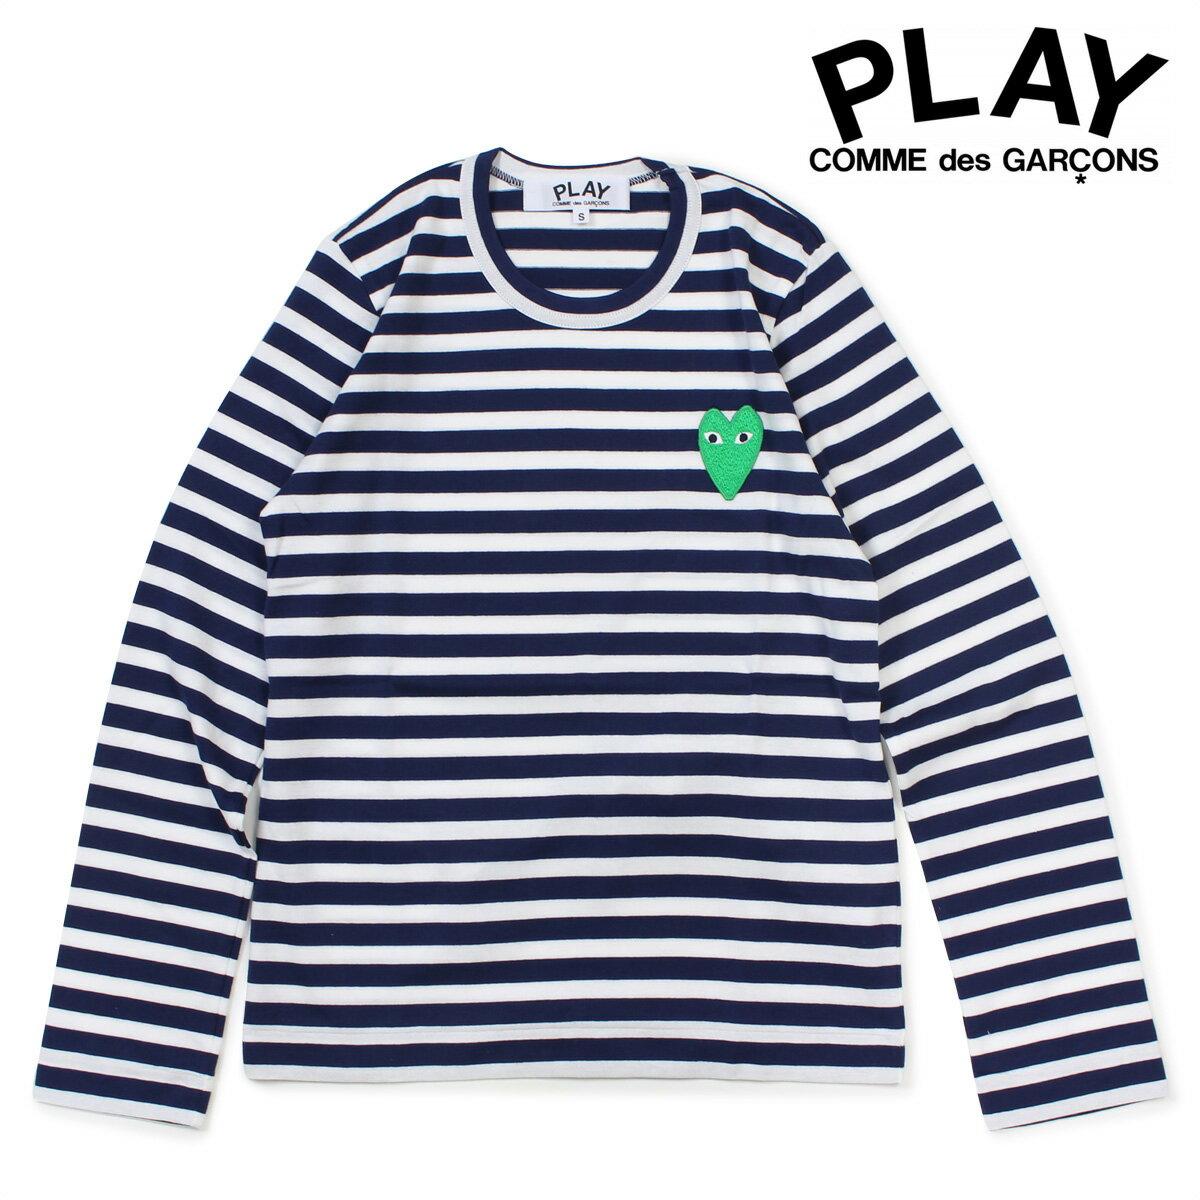 COMME des GARCONS PLAY HEART LS T-SHIRT Tシャツ 長袖 コムデギャルソン レディース ボーダー カットソー AZ-T051 ホワイト [1711]